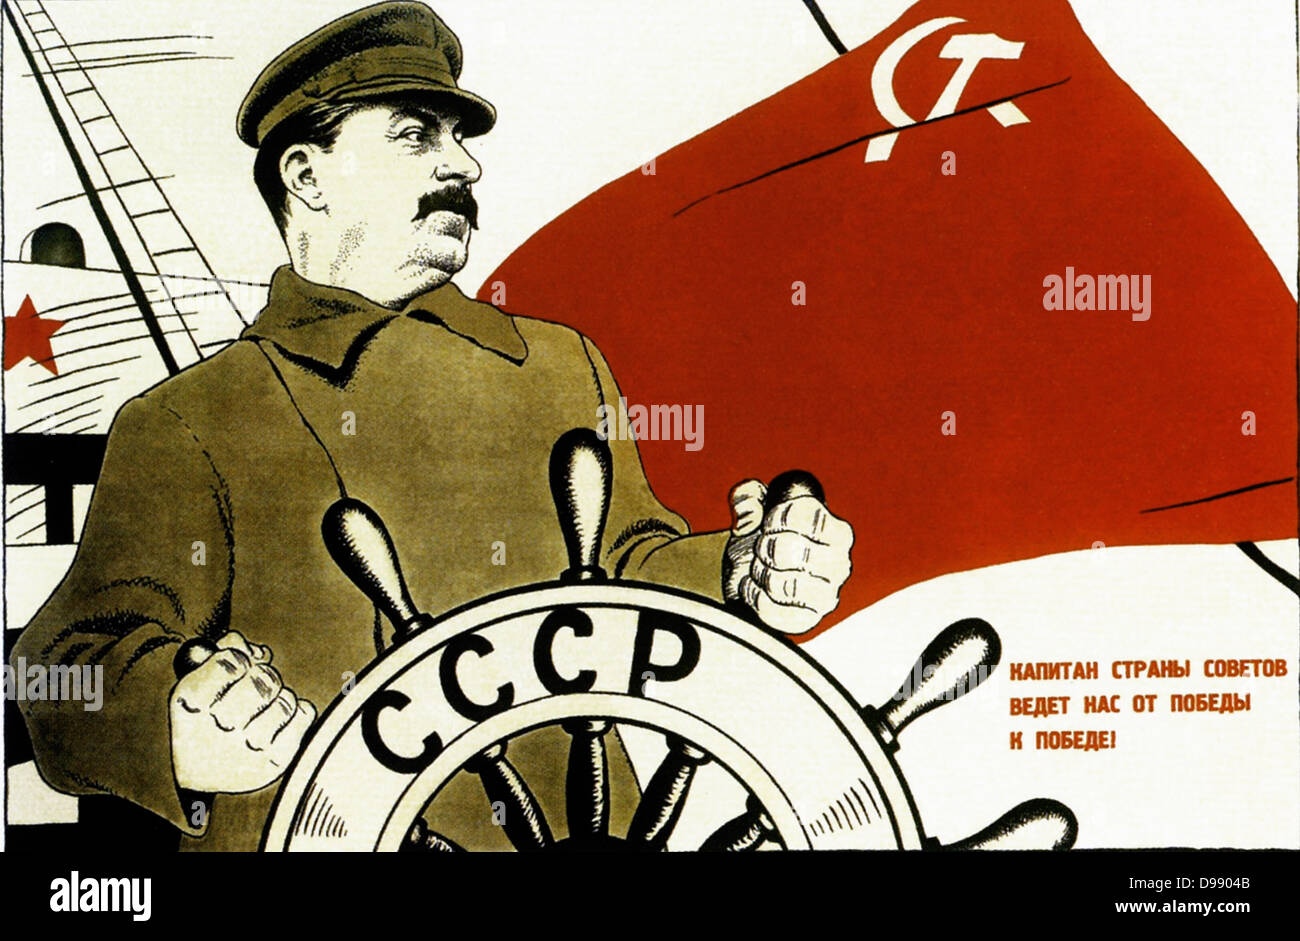 Joseph Stalin Research Paper Josef Stalin Soviet Propaganda Poster Showing A Much Loved Stalin DB